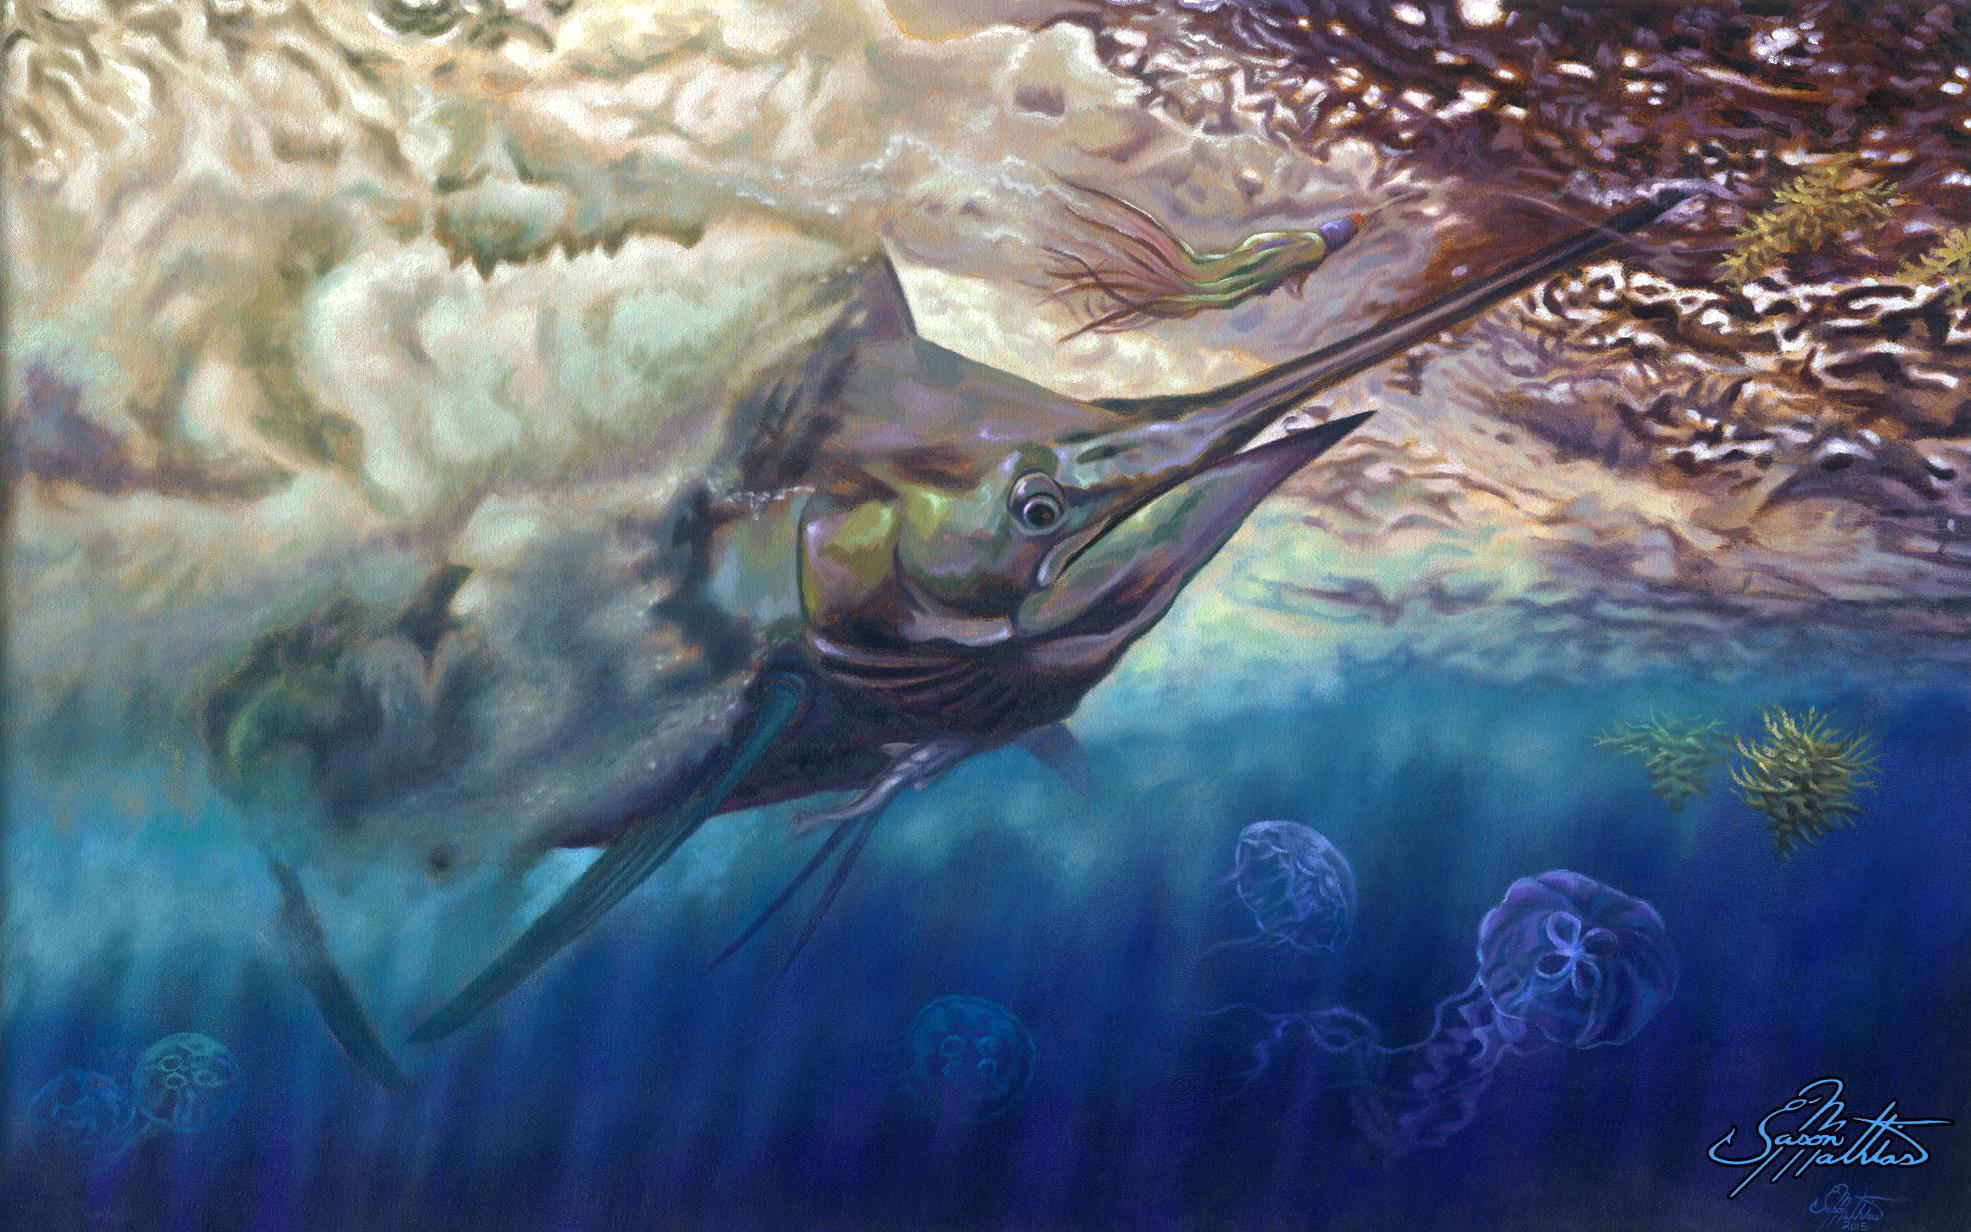 turbulence-blue-marlin-art-jason-mathias.jpg